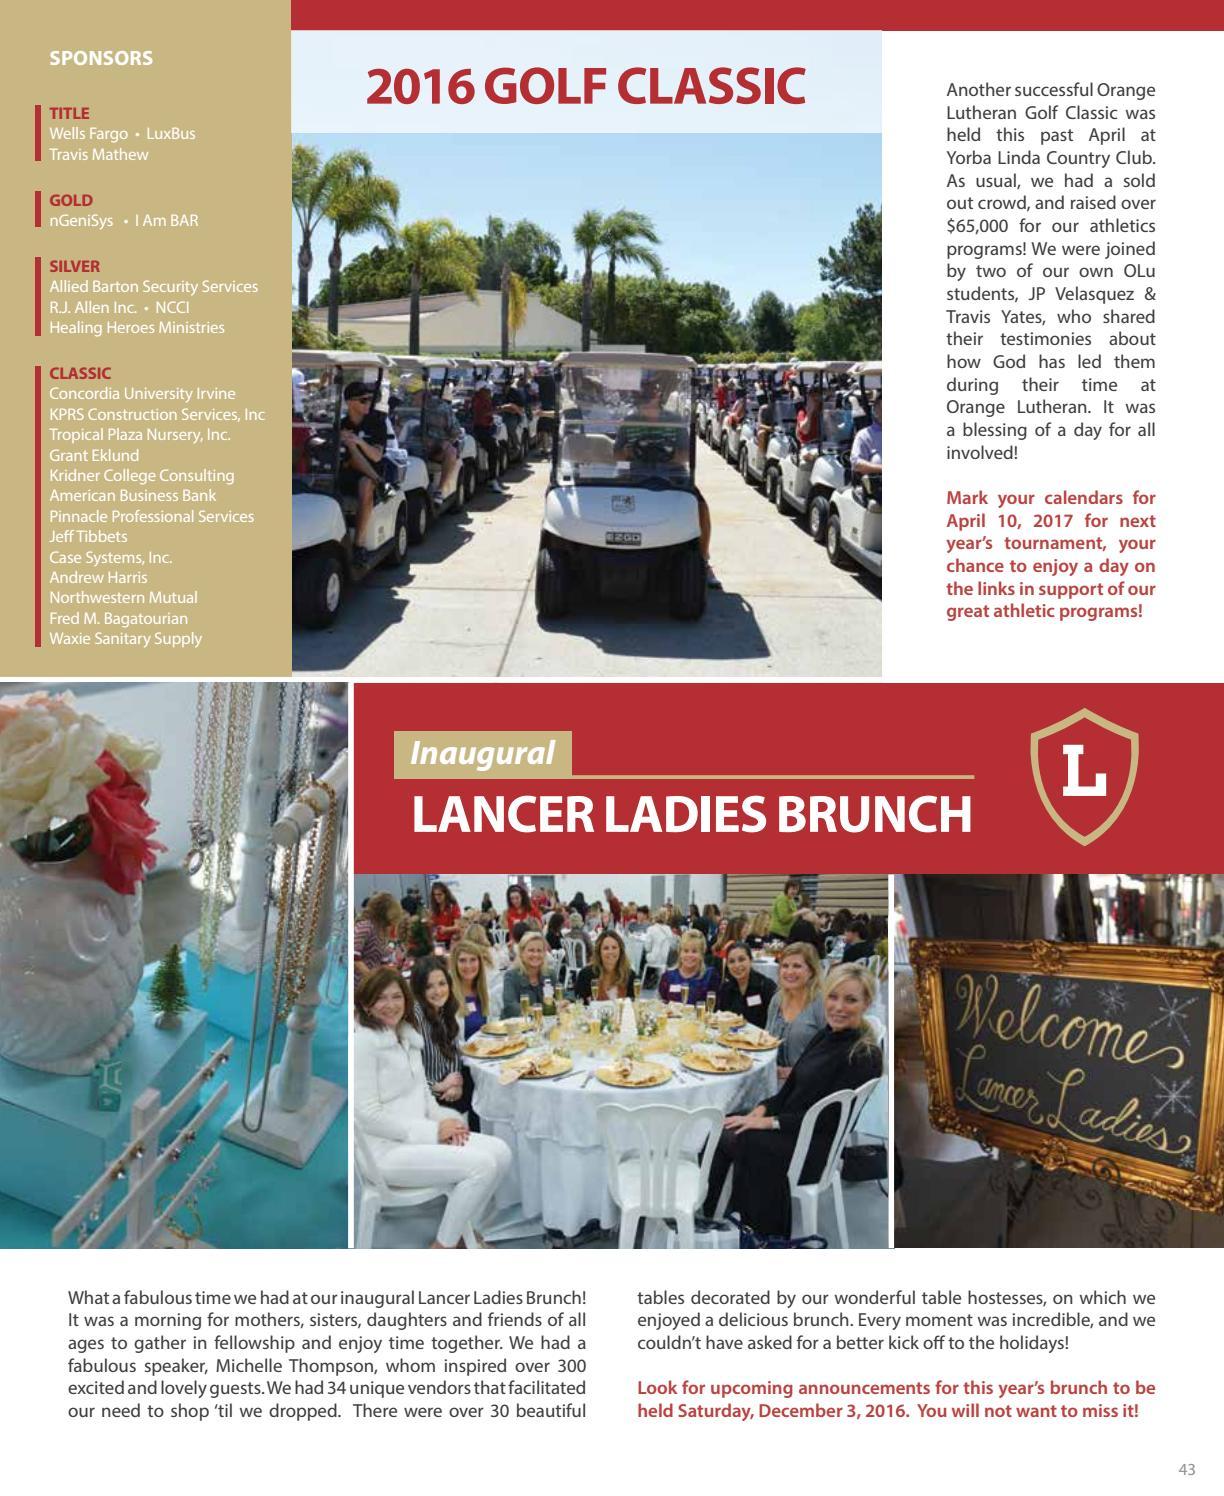 2015-16 Annual Report by Orange Lutheran High School - Issuu